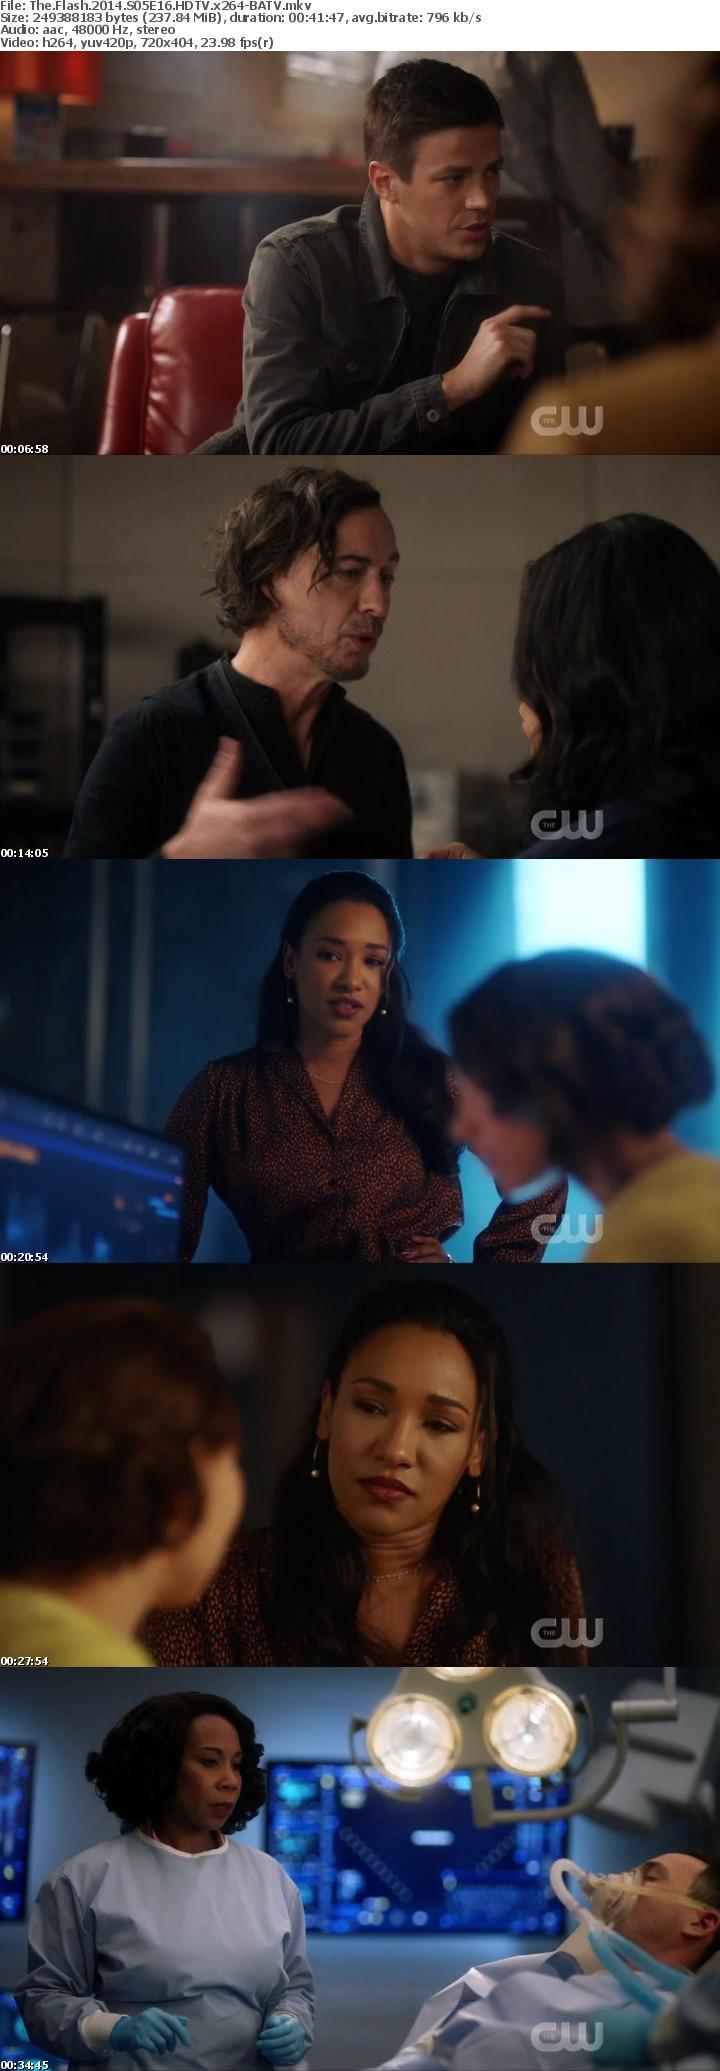 The Flash 2014 S05E16 HDTV x264-BATV